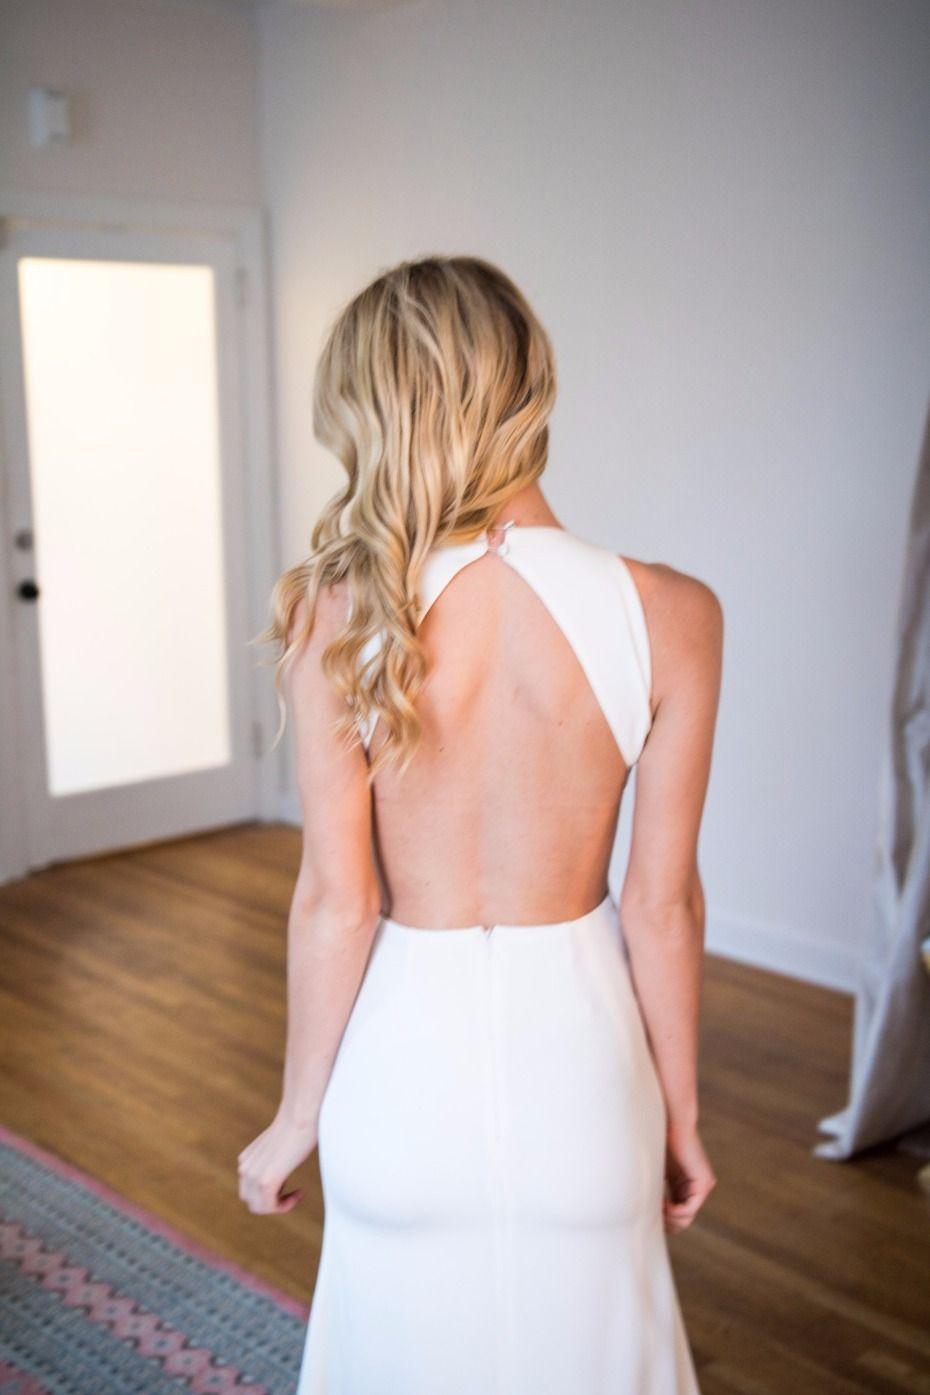 11 On Trend Wedding Dress Styles From Still White Sarah Seven Wedding Dress Trends Dresses [ 1395 x 930 Pixel ]